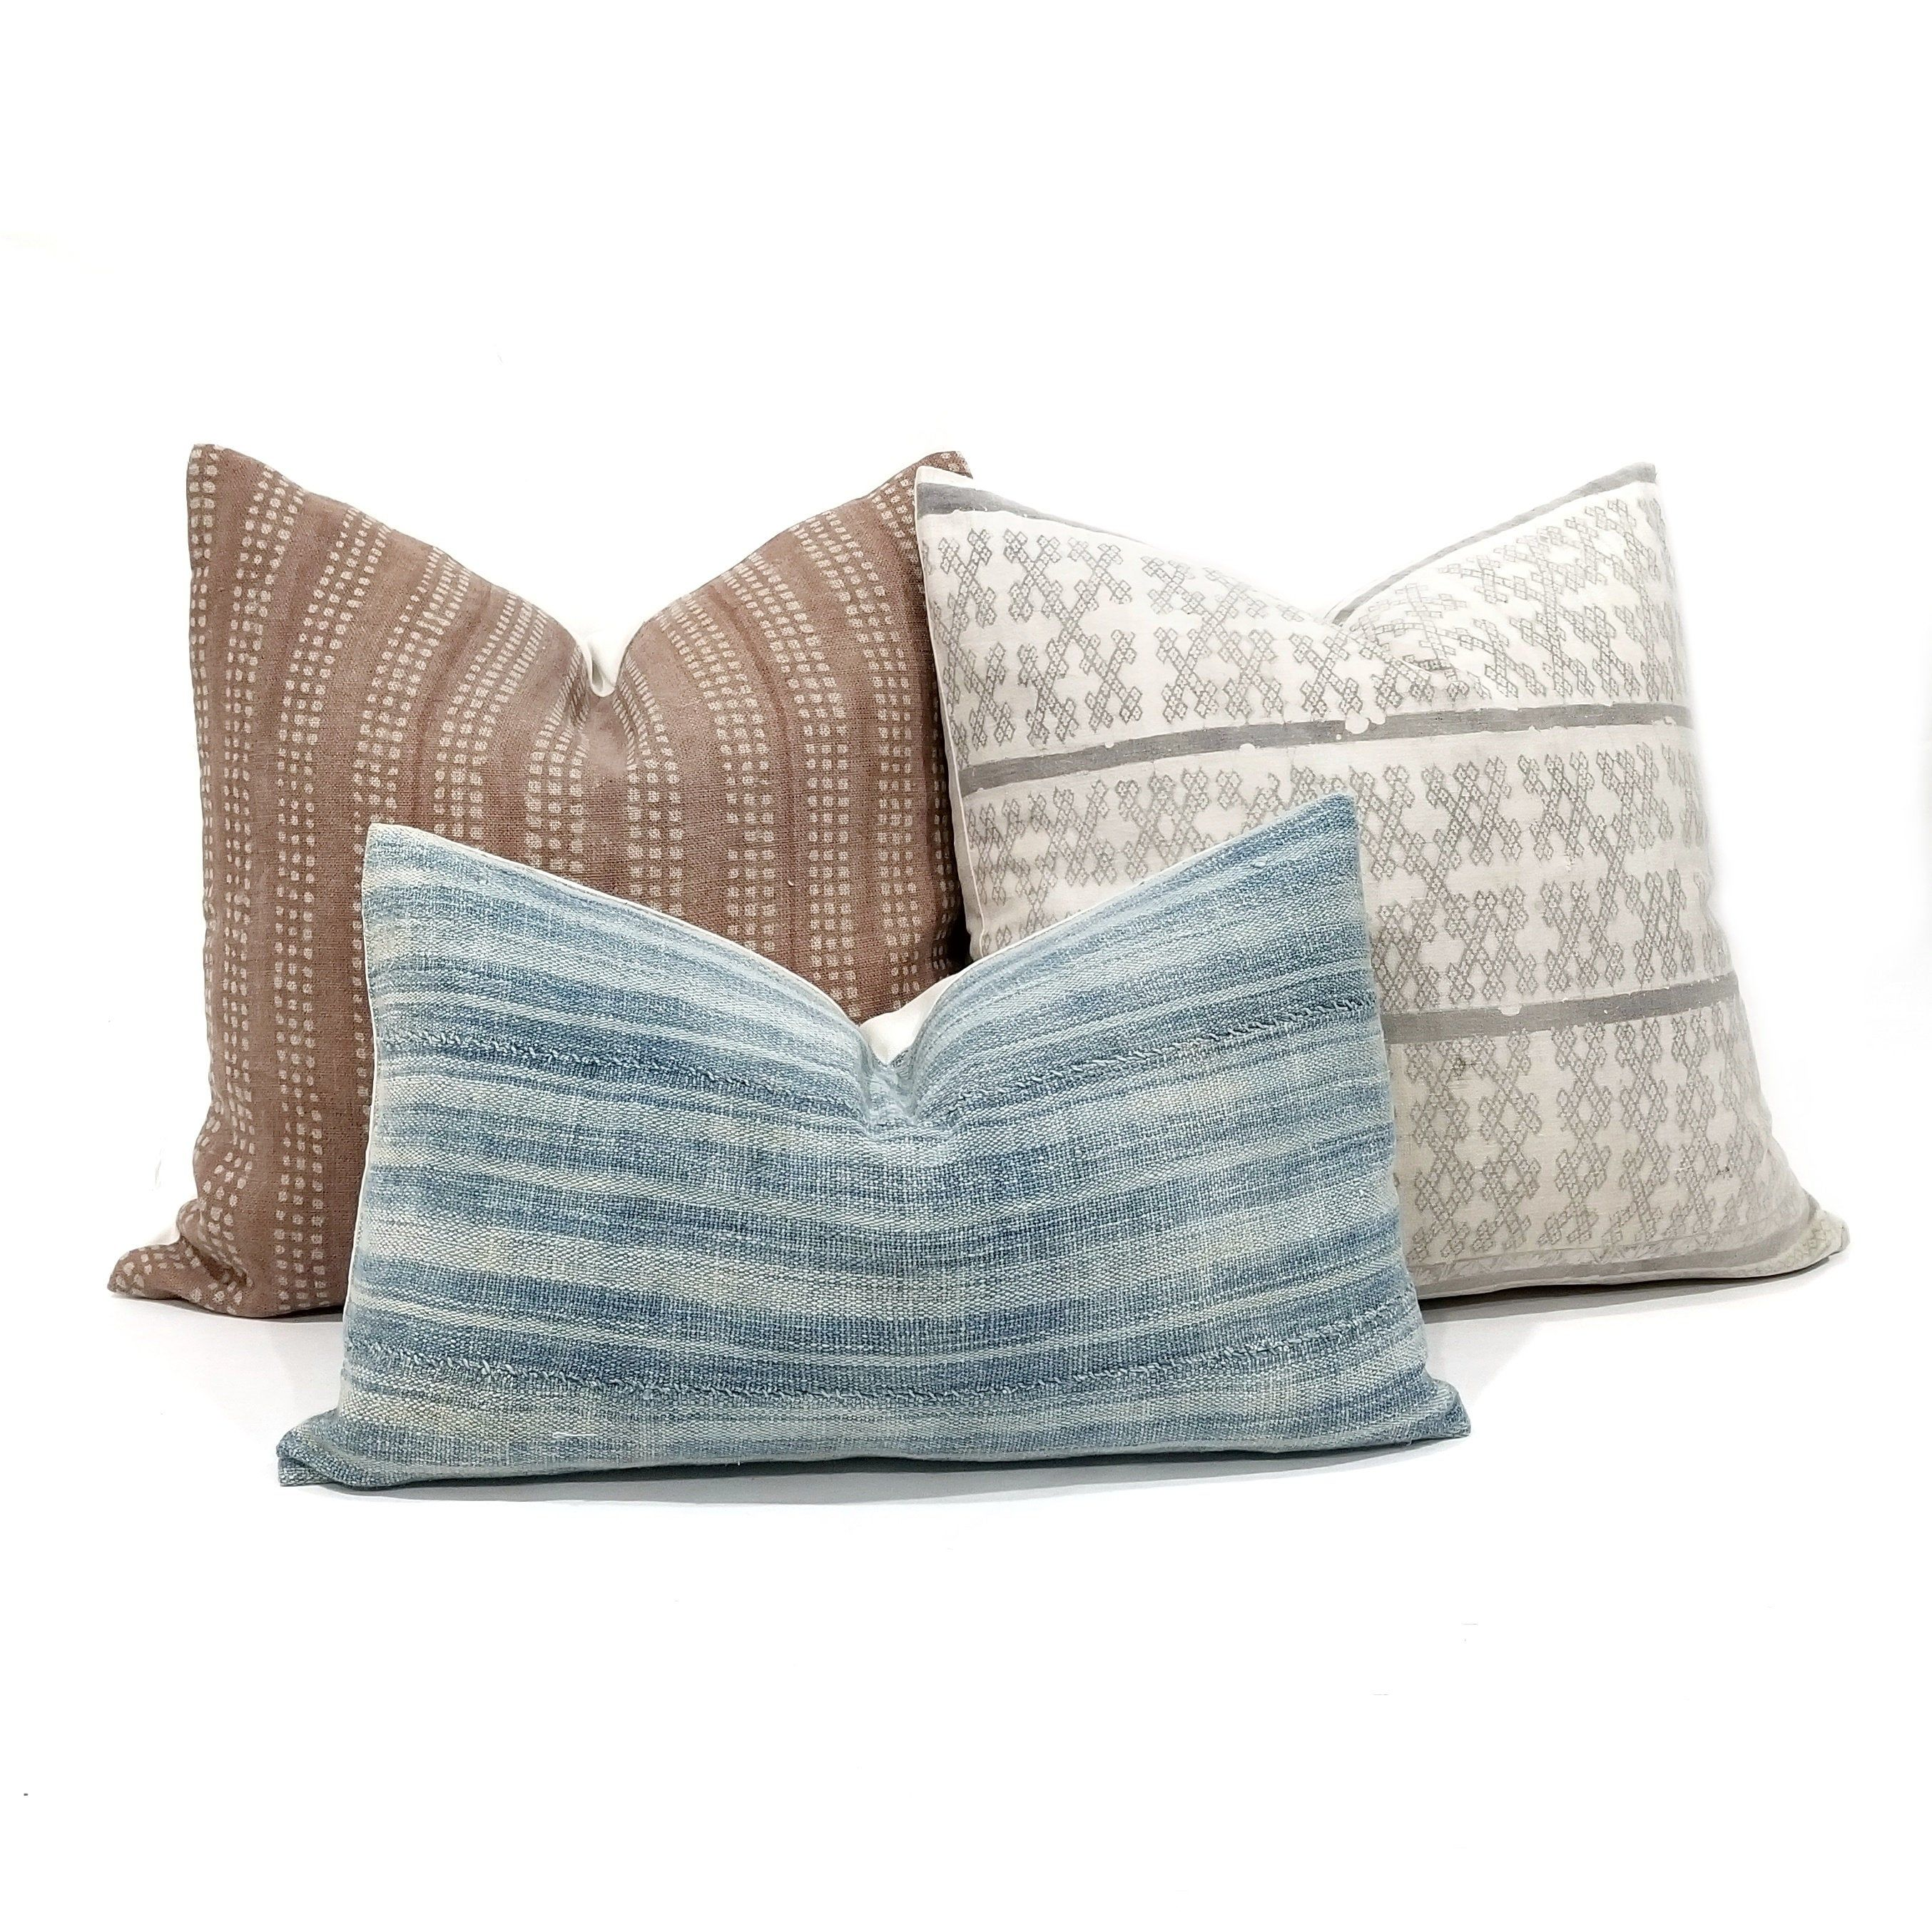 block printed linen pillow cover